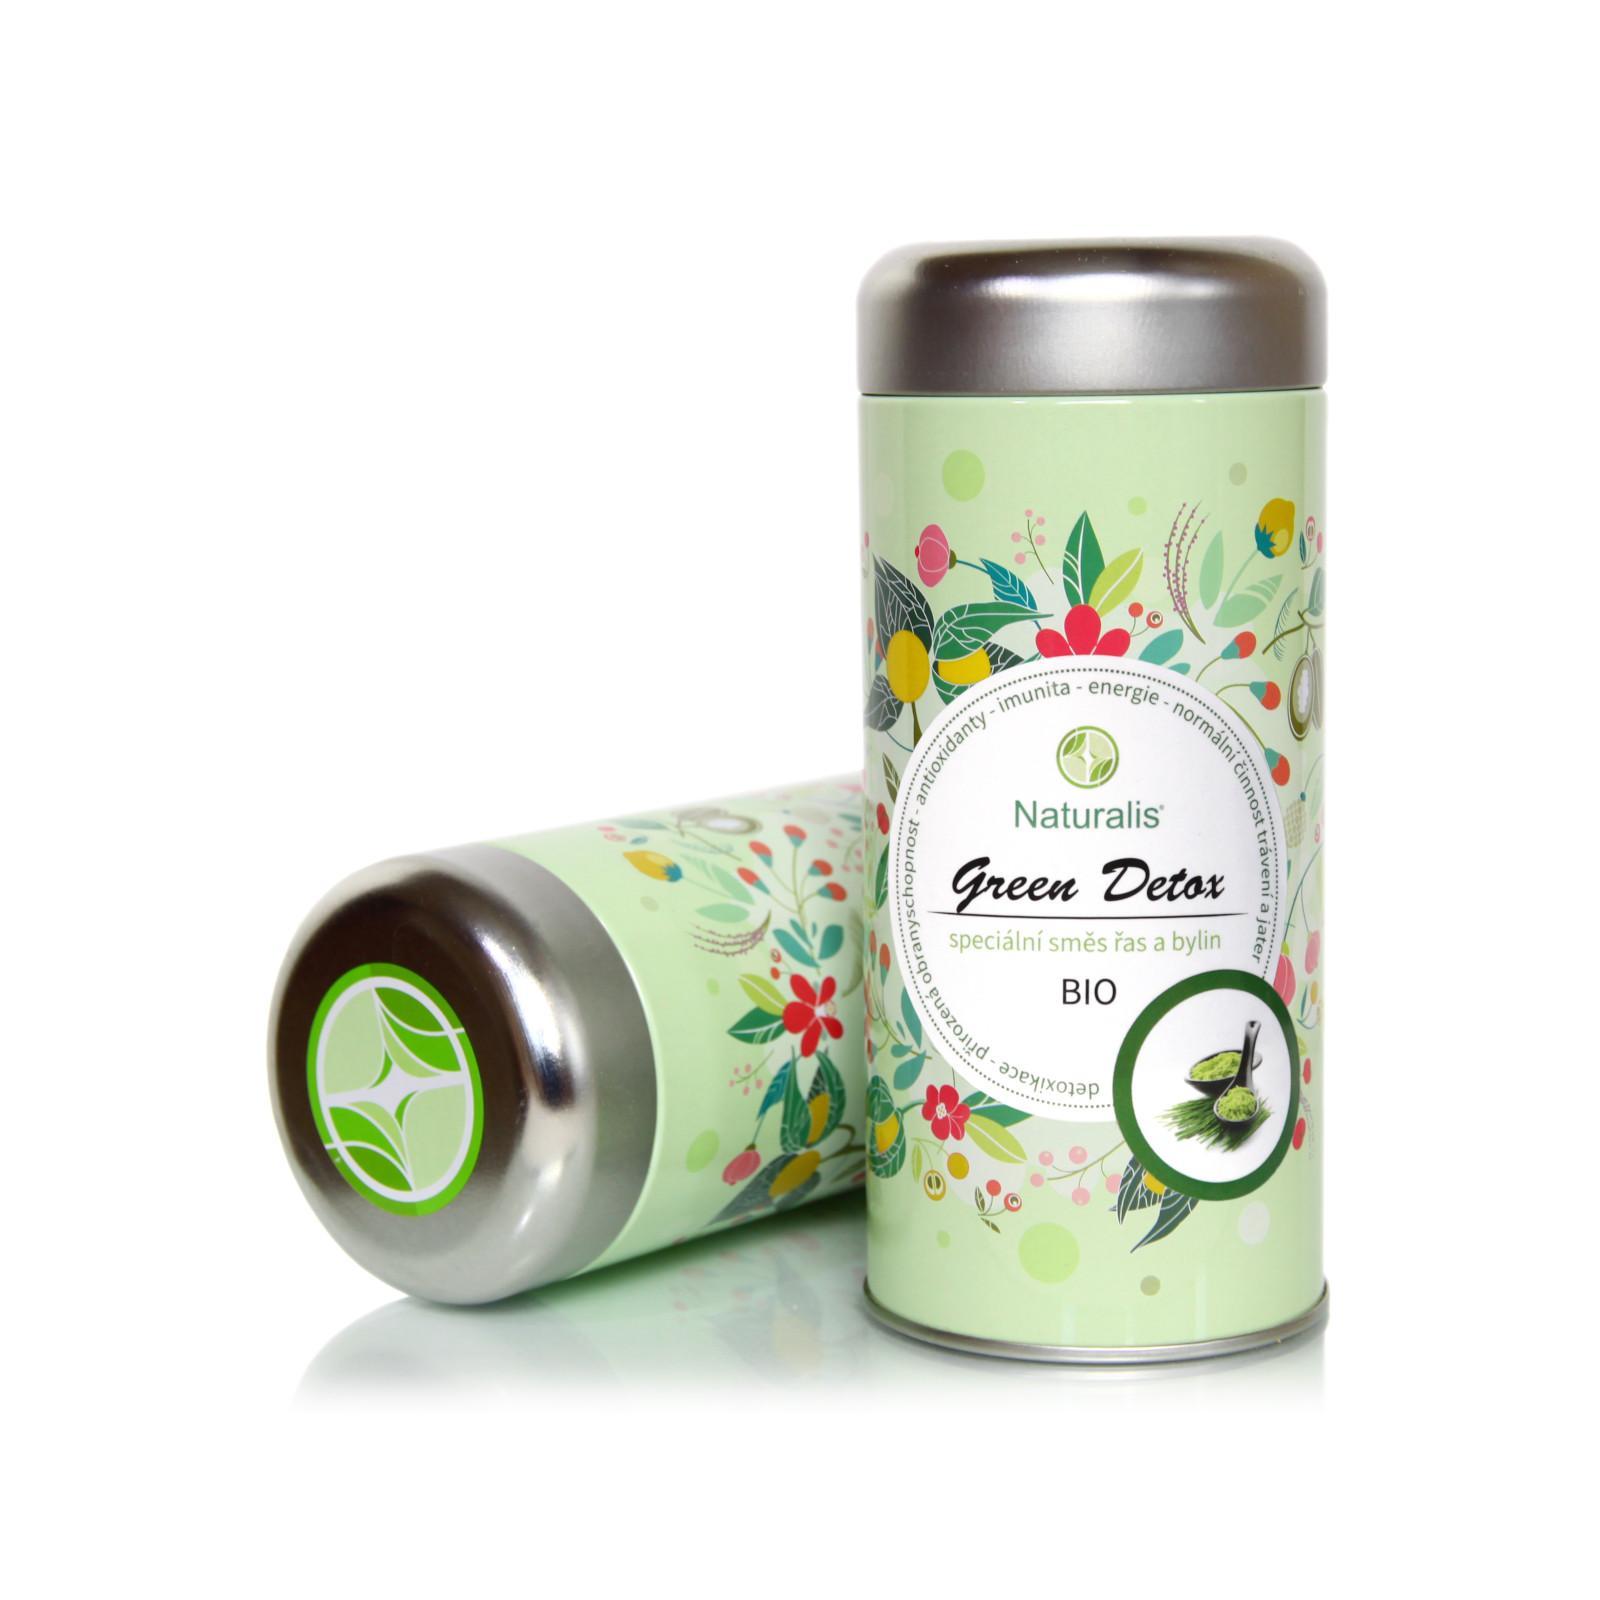 Naturalis Green detox 70 g